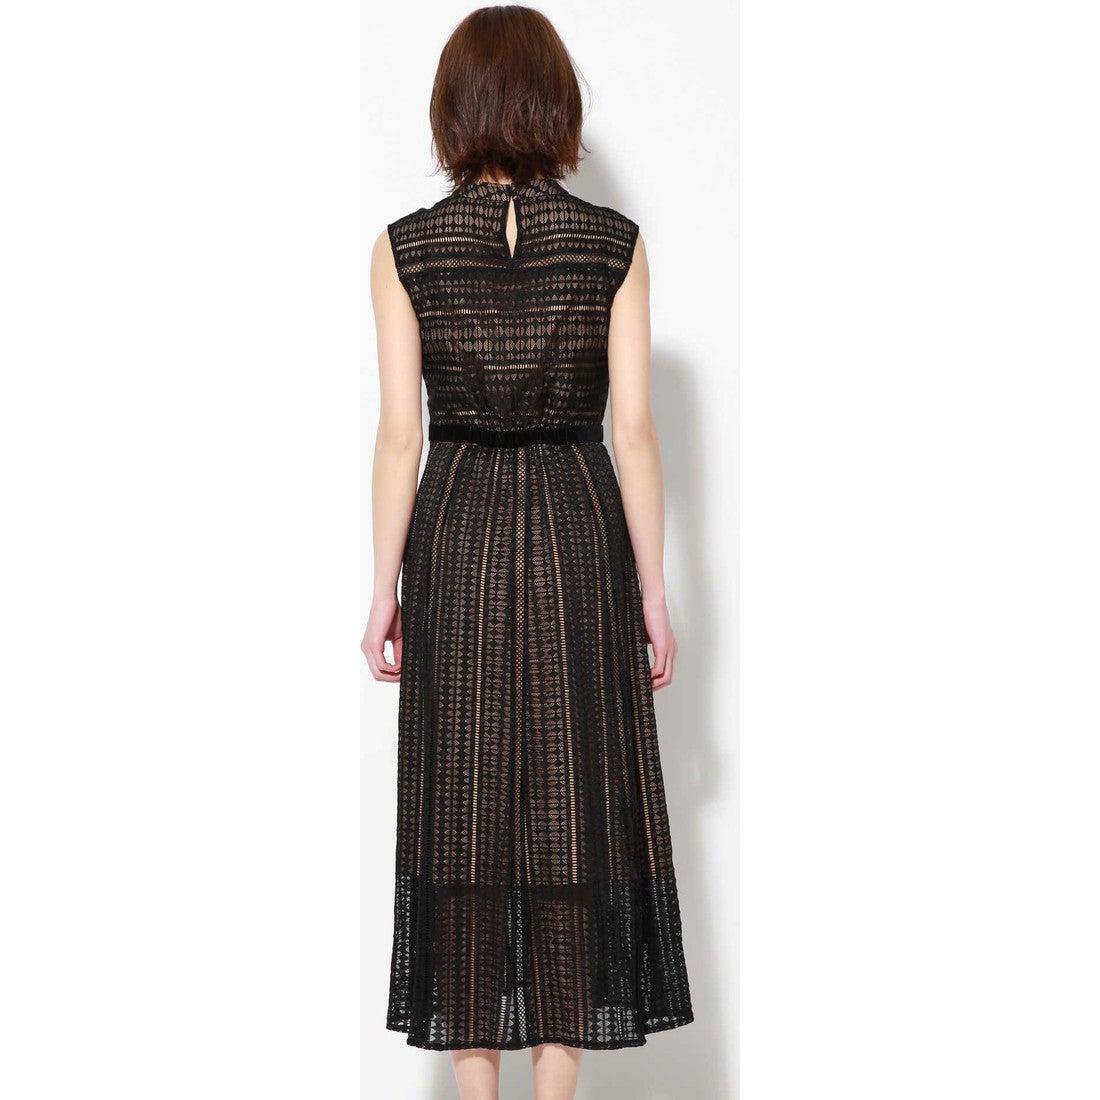 c9f4ff759cdde ROSE BUD 幾何レースノースリーブドレス ブラック -靴&ファッション通販 ...